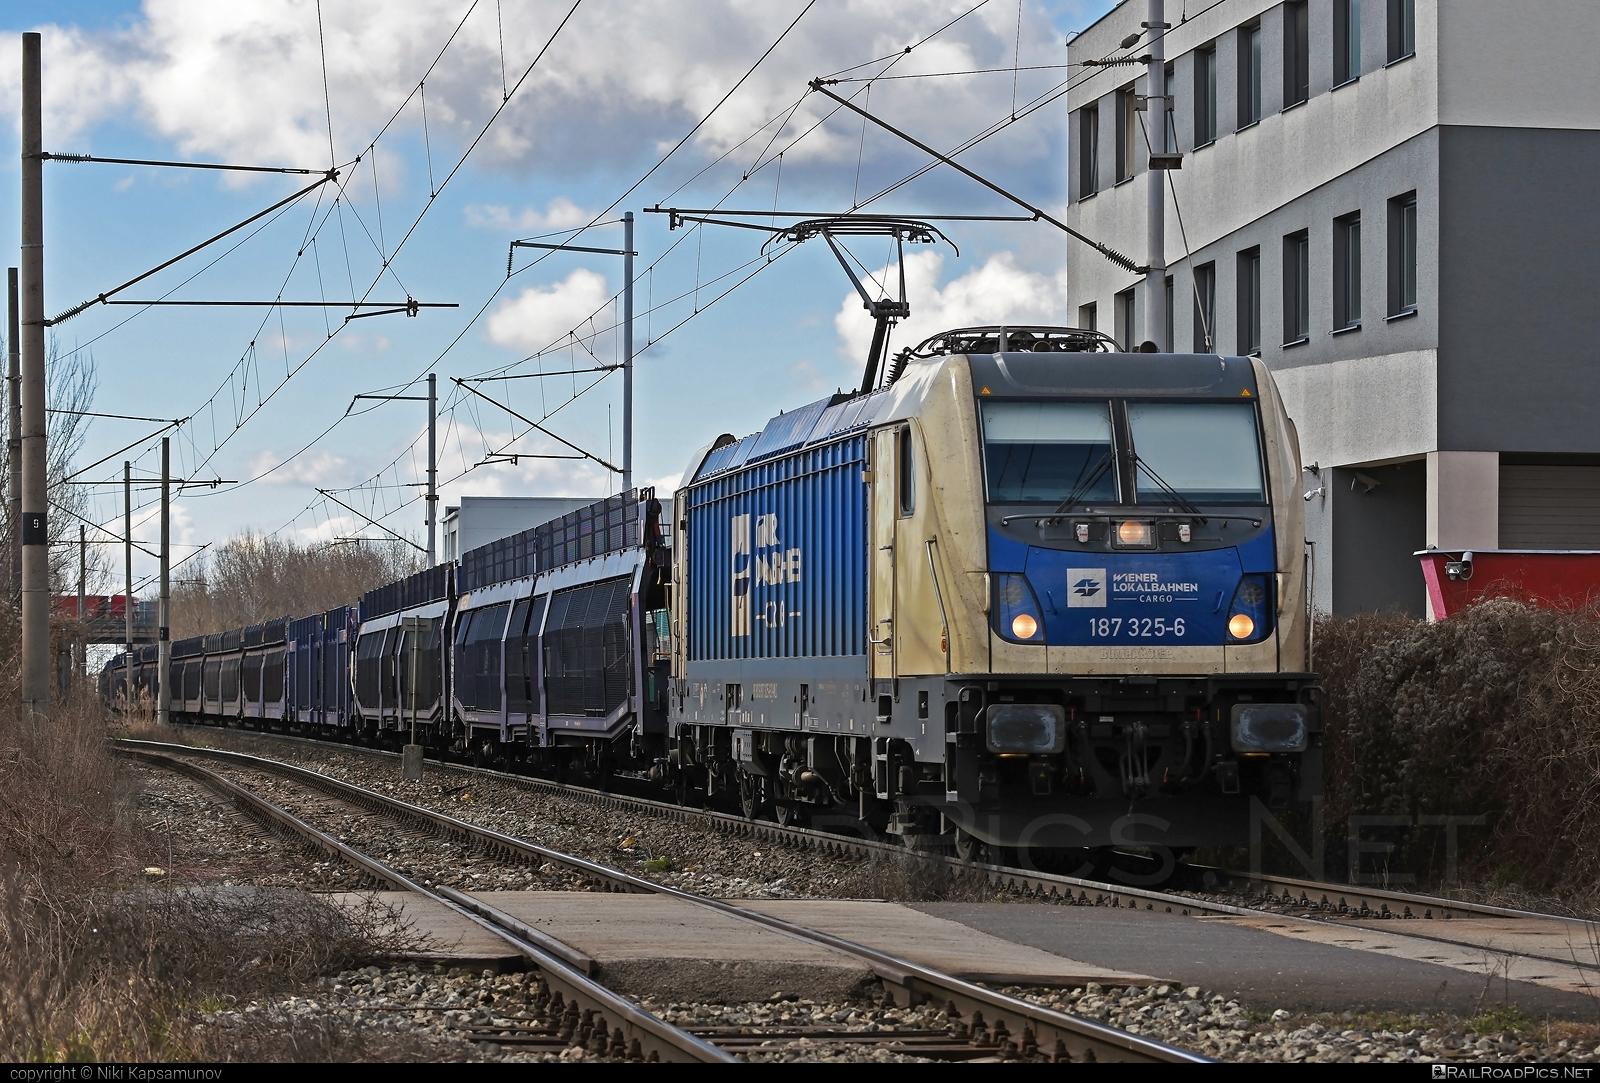 Bombardier TRAXX F160 AC3 - 187 325-6 operated by Wiener Lokalbahnen Cargo GmbH #bombardier #bombardiertraxx #carcarrierwagon #traxx #traxxf160 #traxxf160ac #traxxf160ac3 #wienerlokalbahnencargo #wienerlokalbahnencargogmbh #wlc